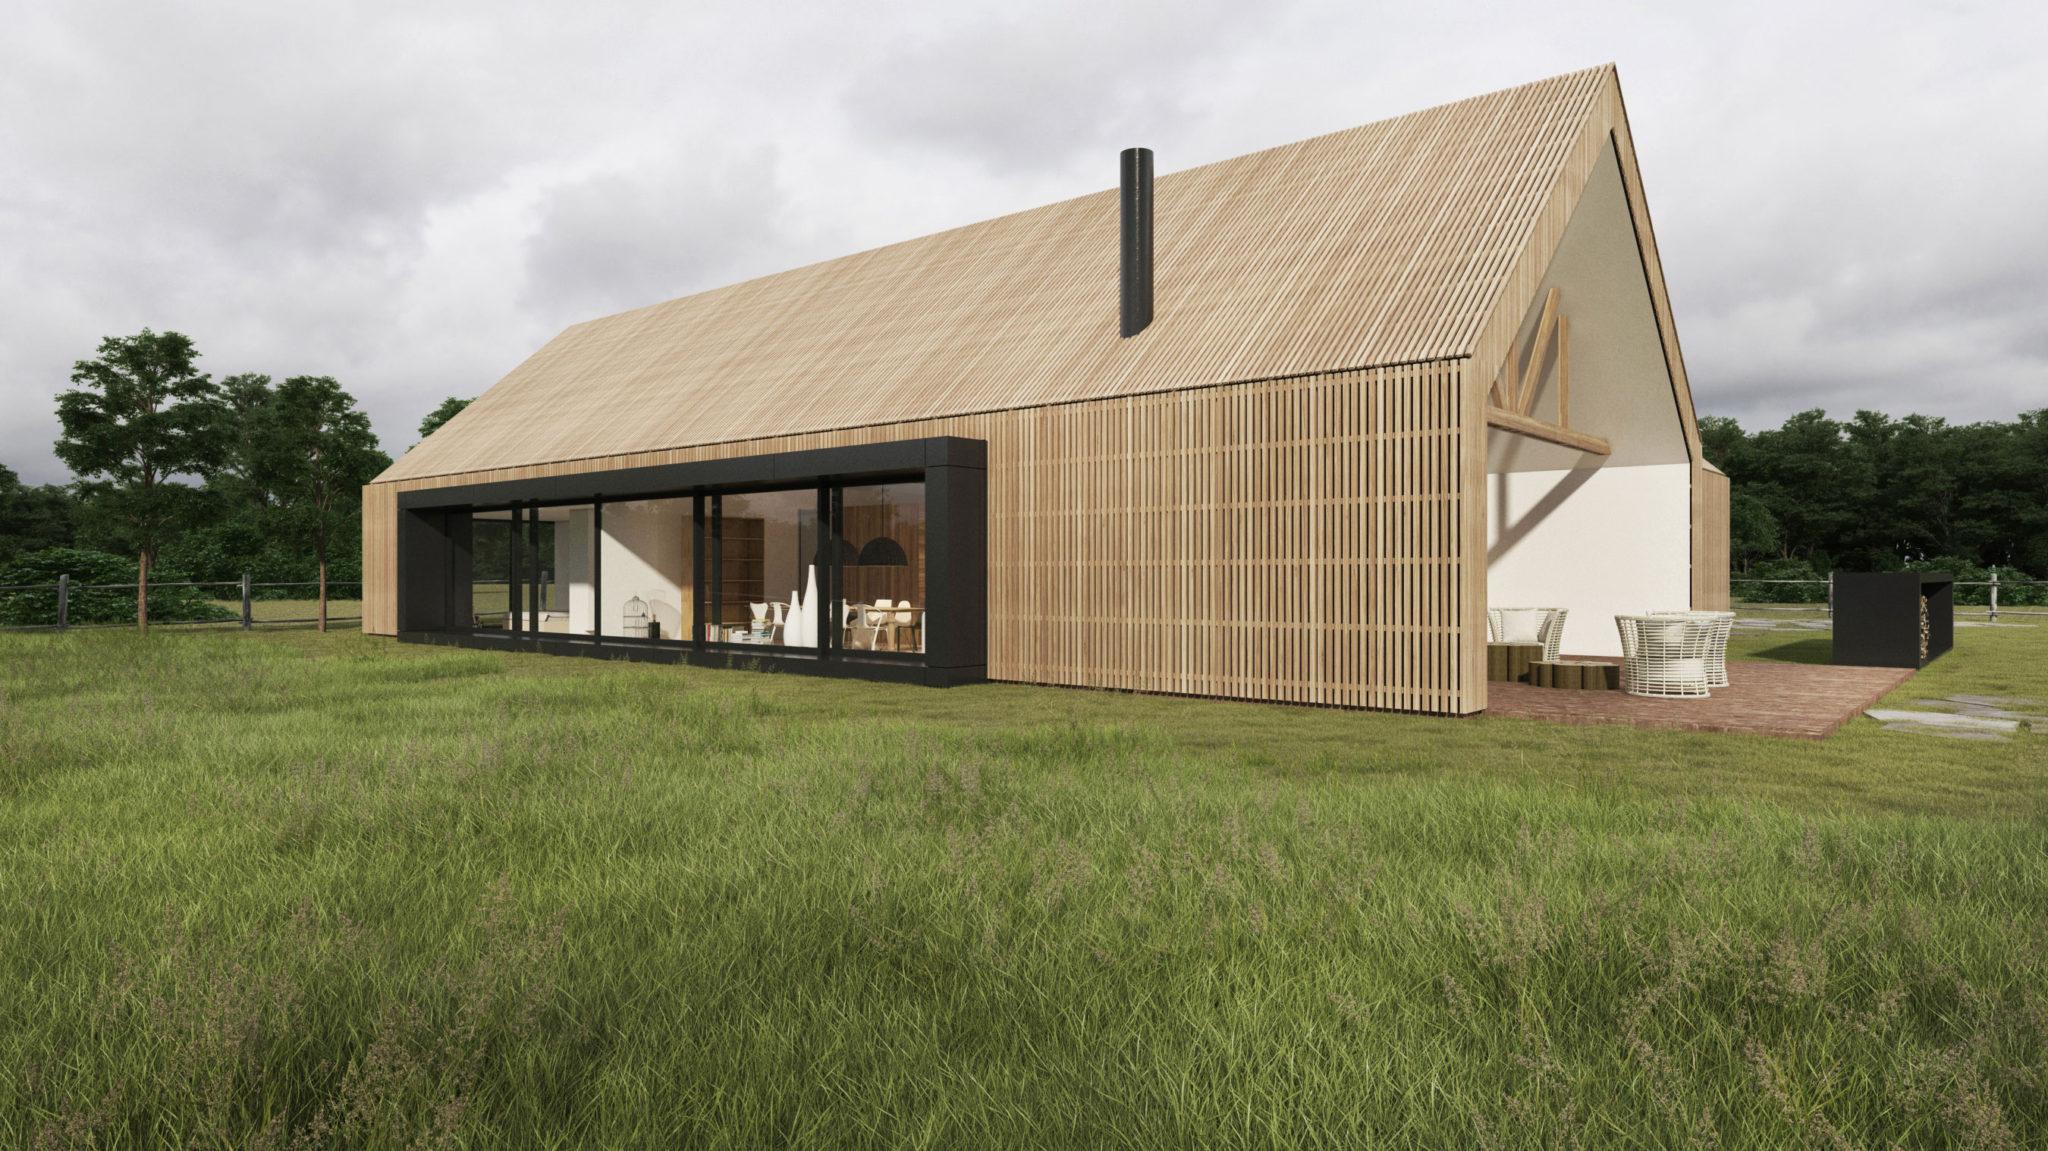 House modern barn pozna architekt wn trz pozna for Barn homes australia